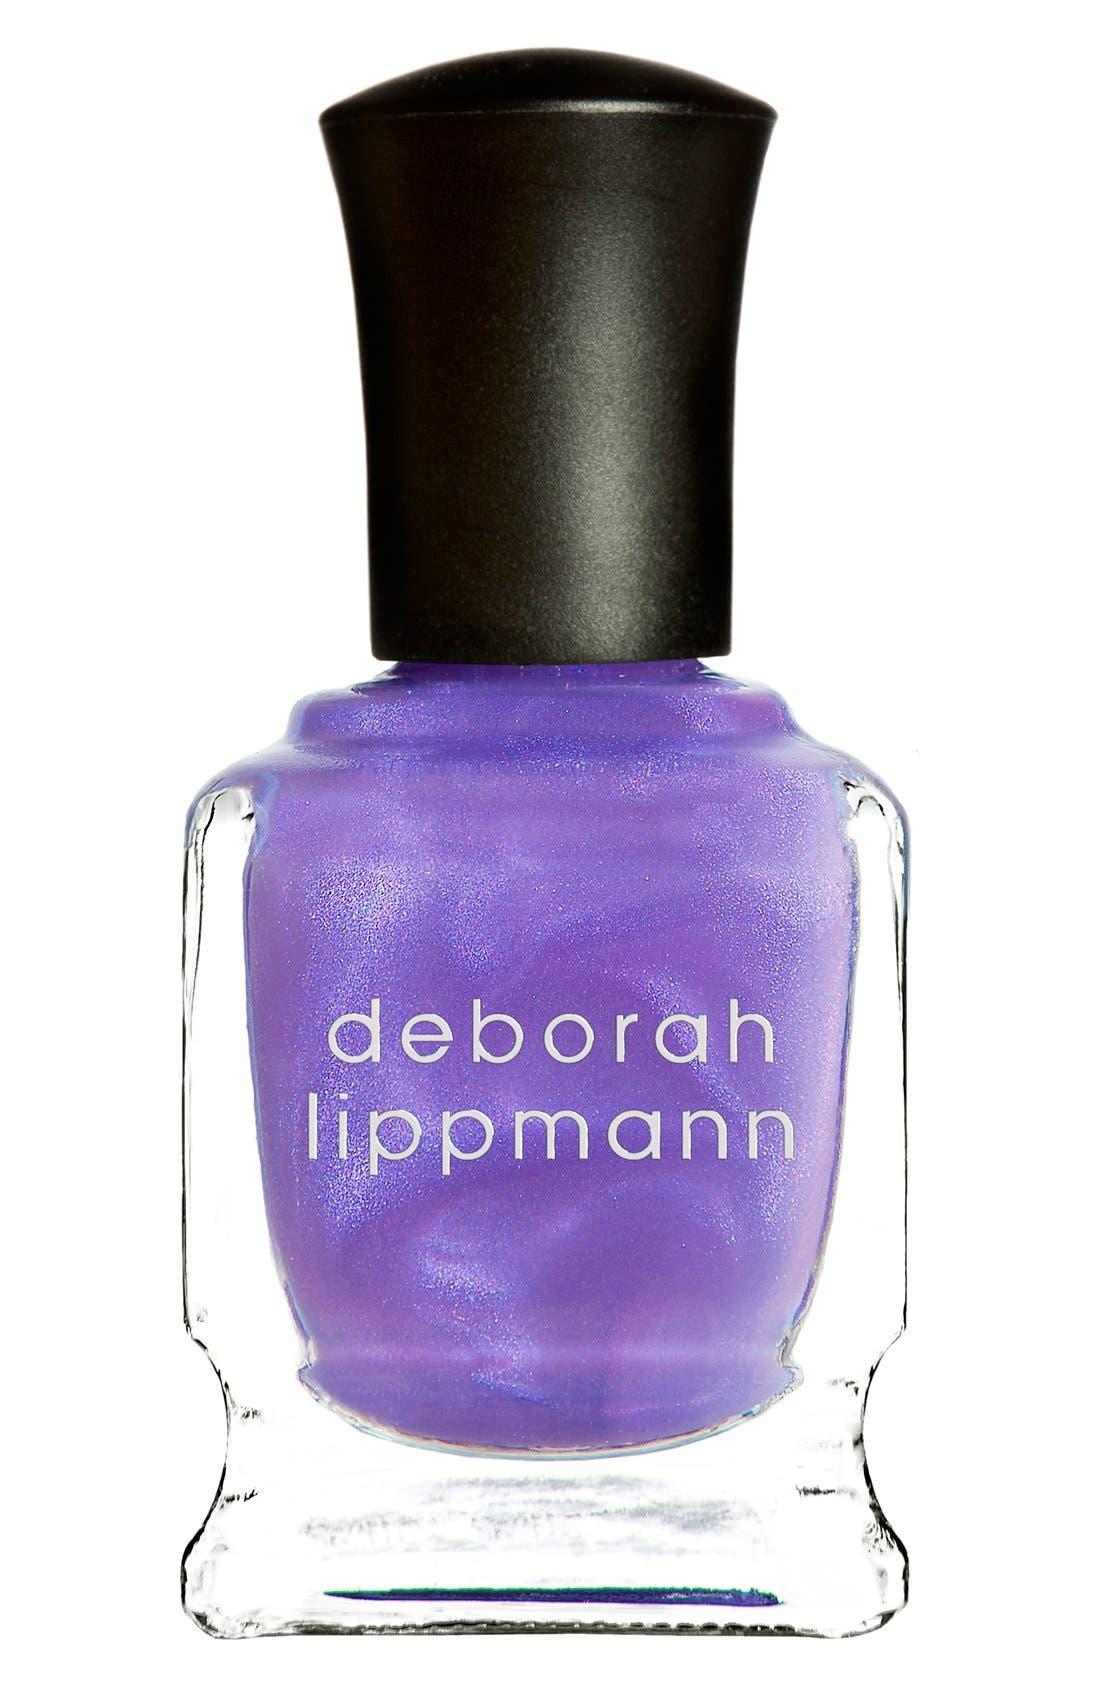 Deborah Lippmann'Genie in a Bottle' Illuminating Nail Tone Perfector Base Coat